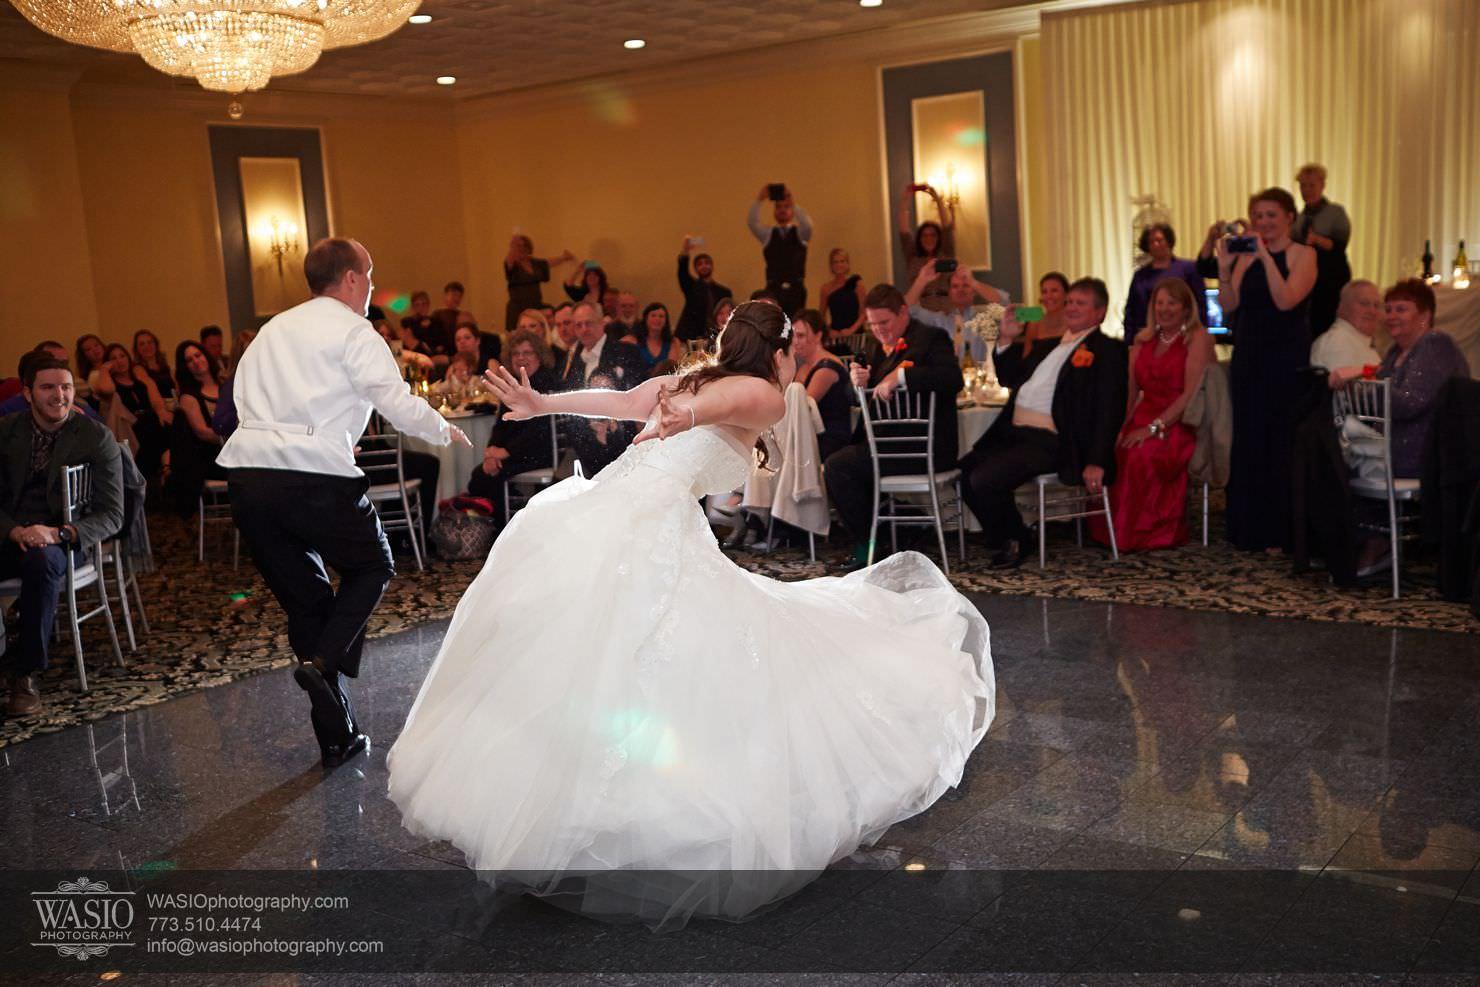 Rosemont-Fall-Wedding-Lauren-and-David-026 Rosemont Fall Wedding - Lauren + David